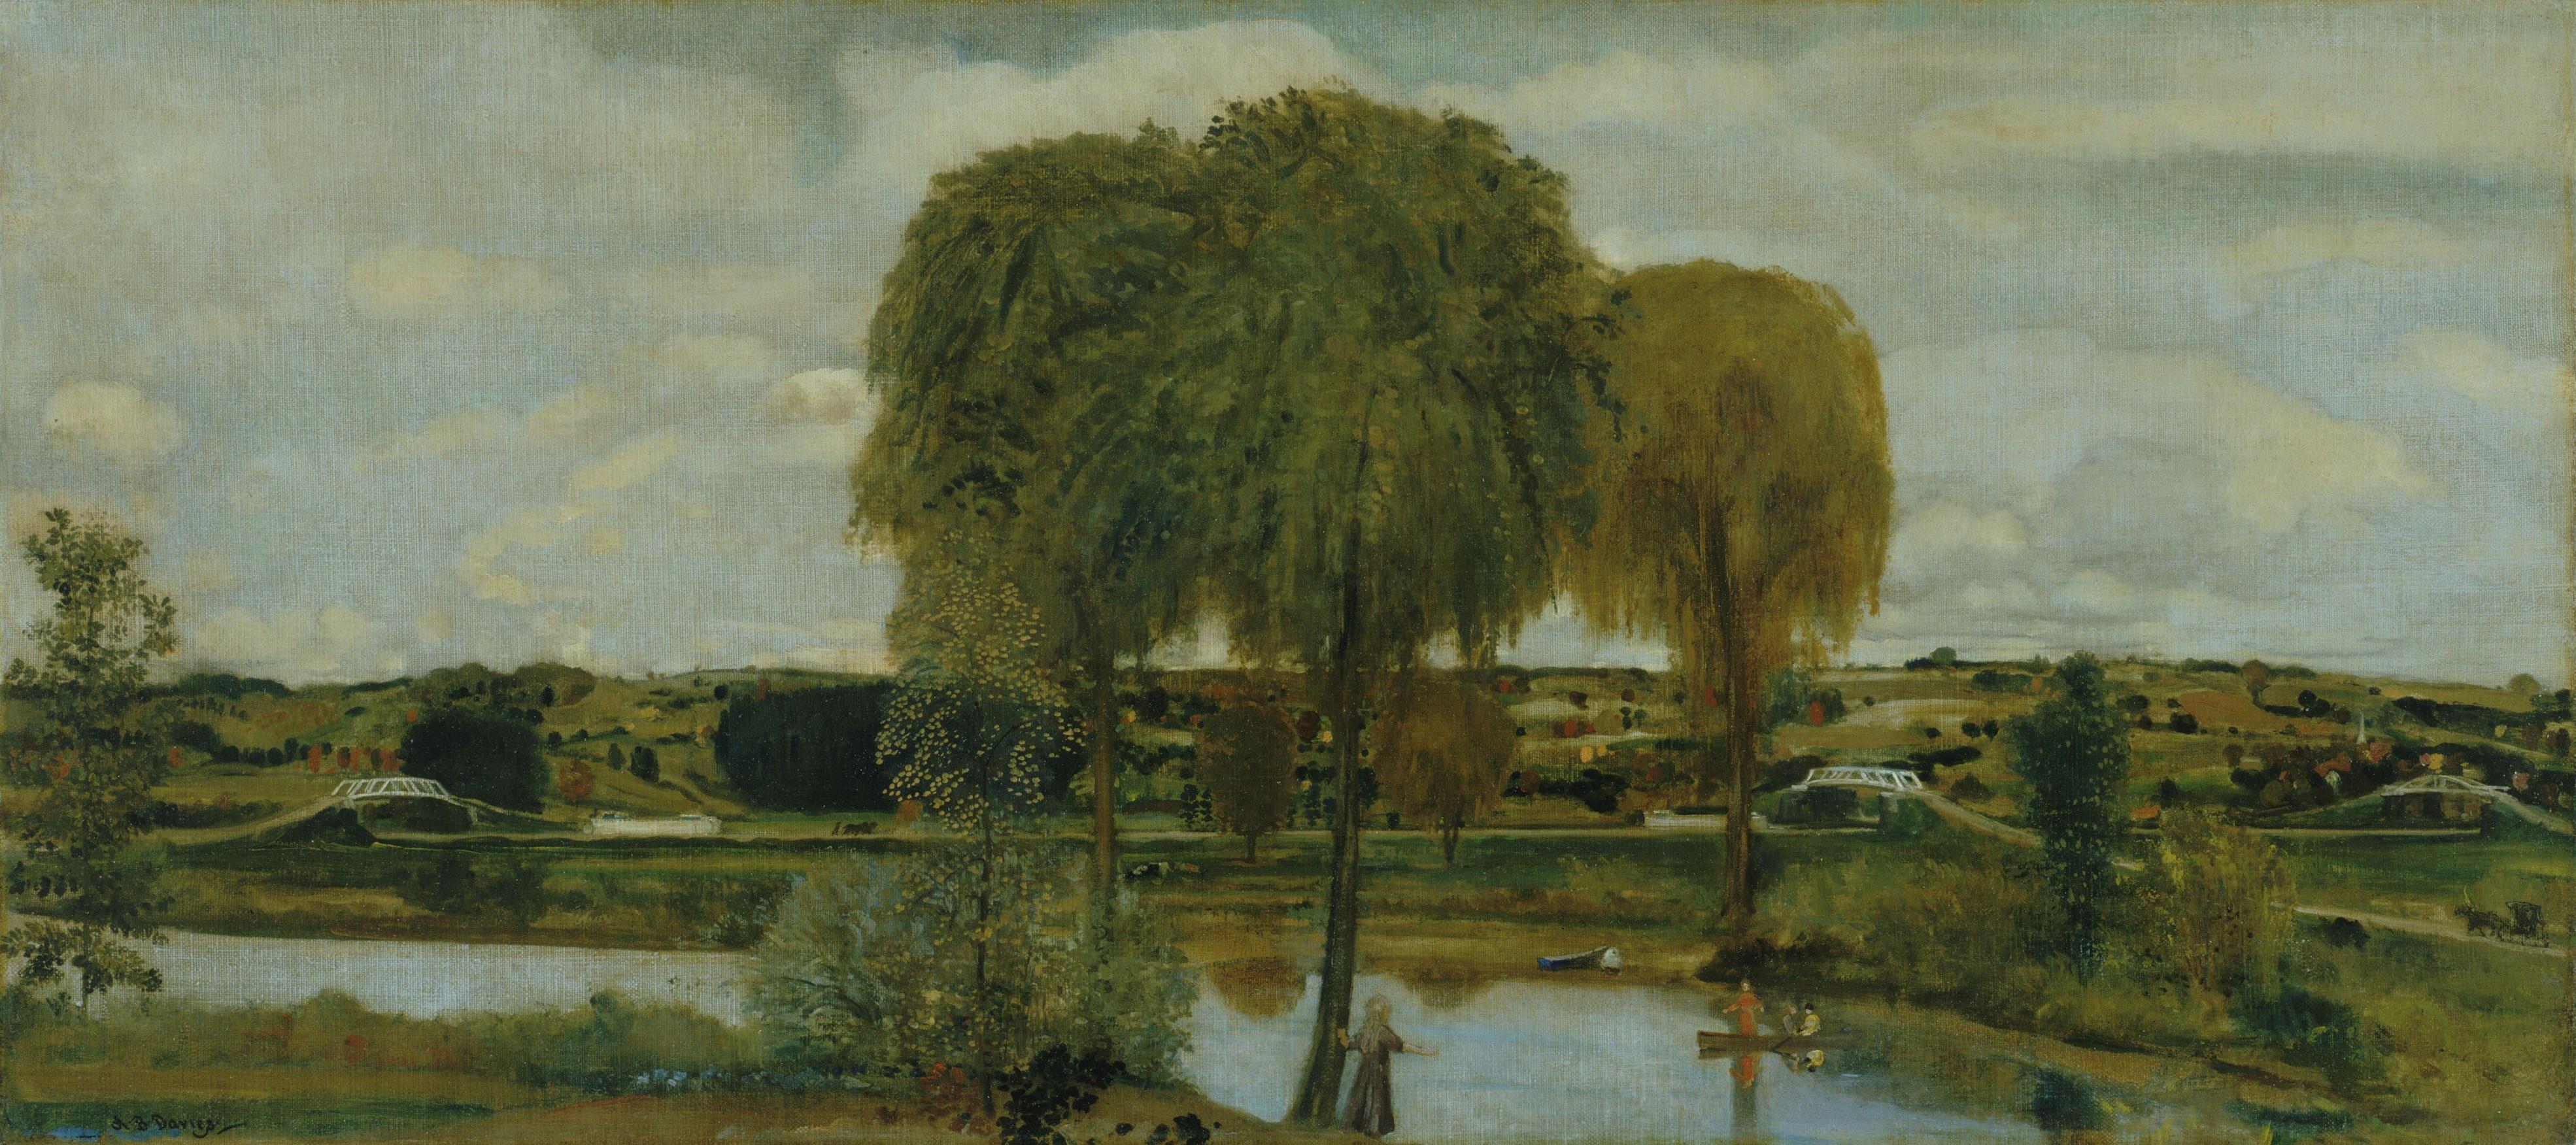 Arthur_B._Davies_-_Along_the_Erie_Canal_-_